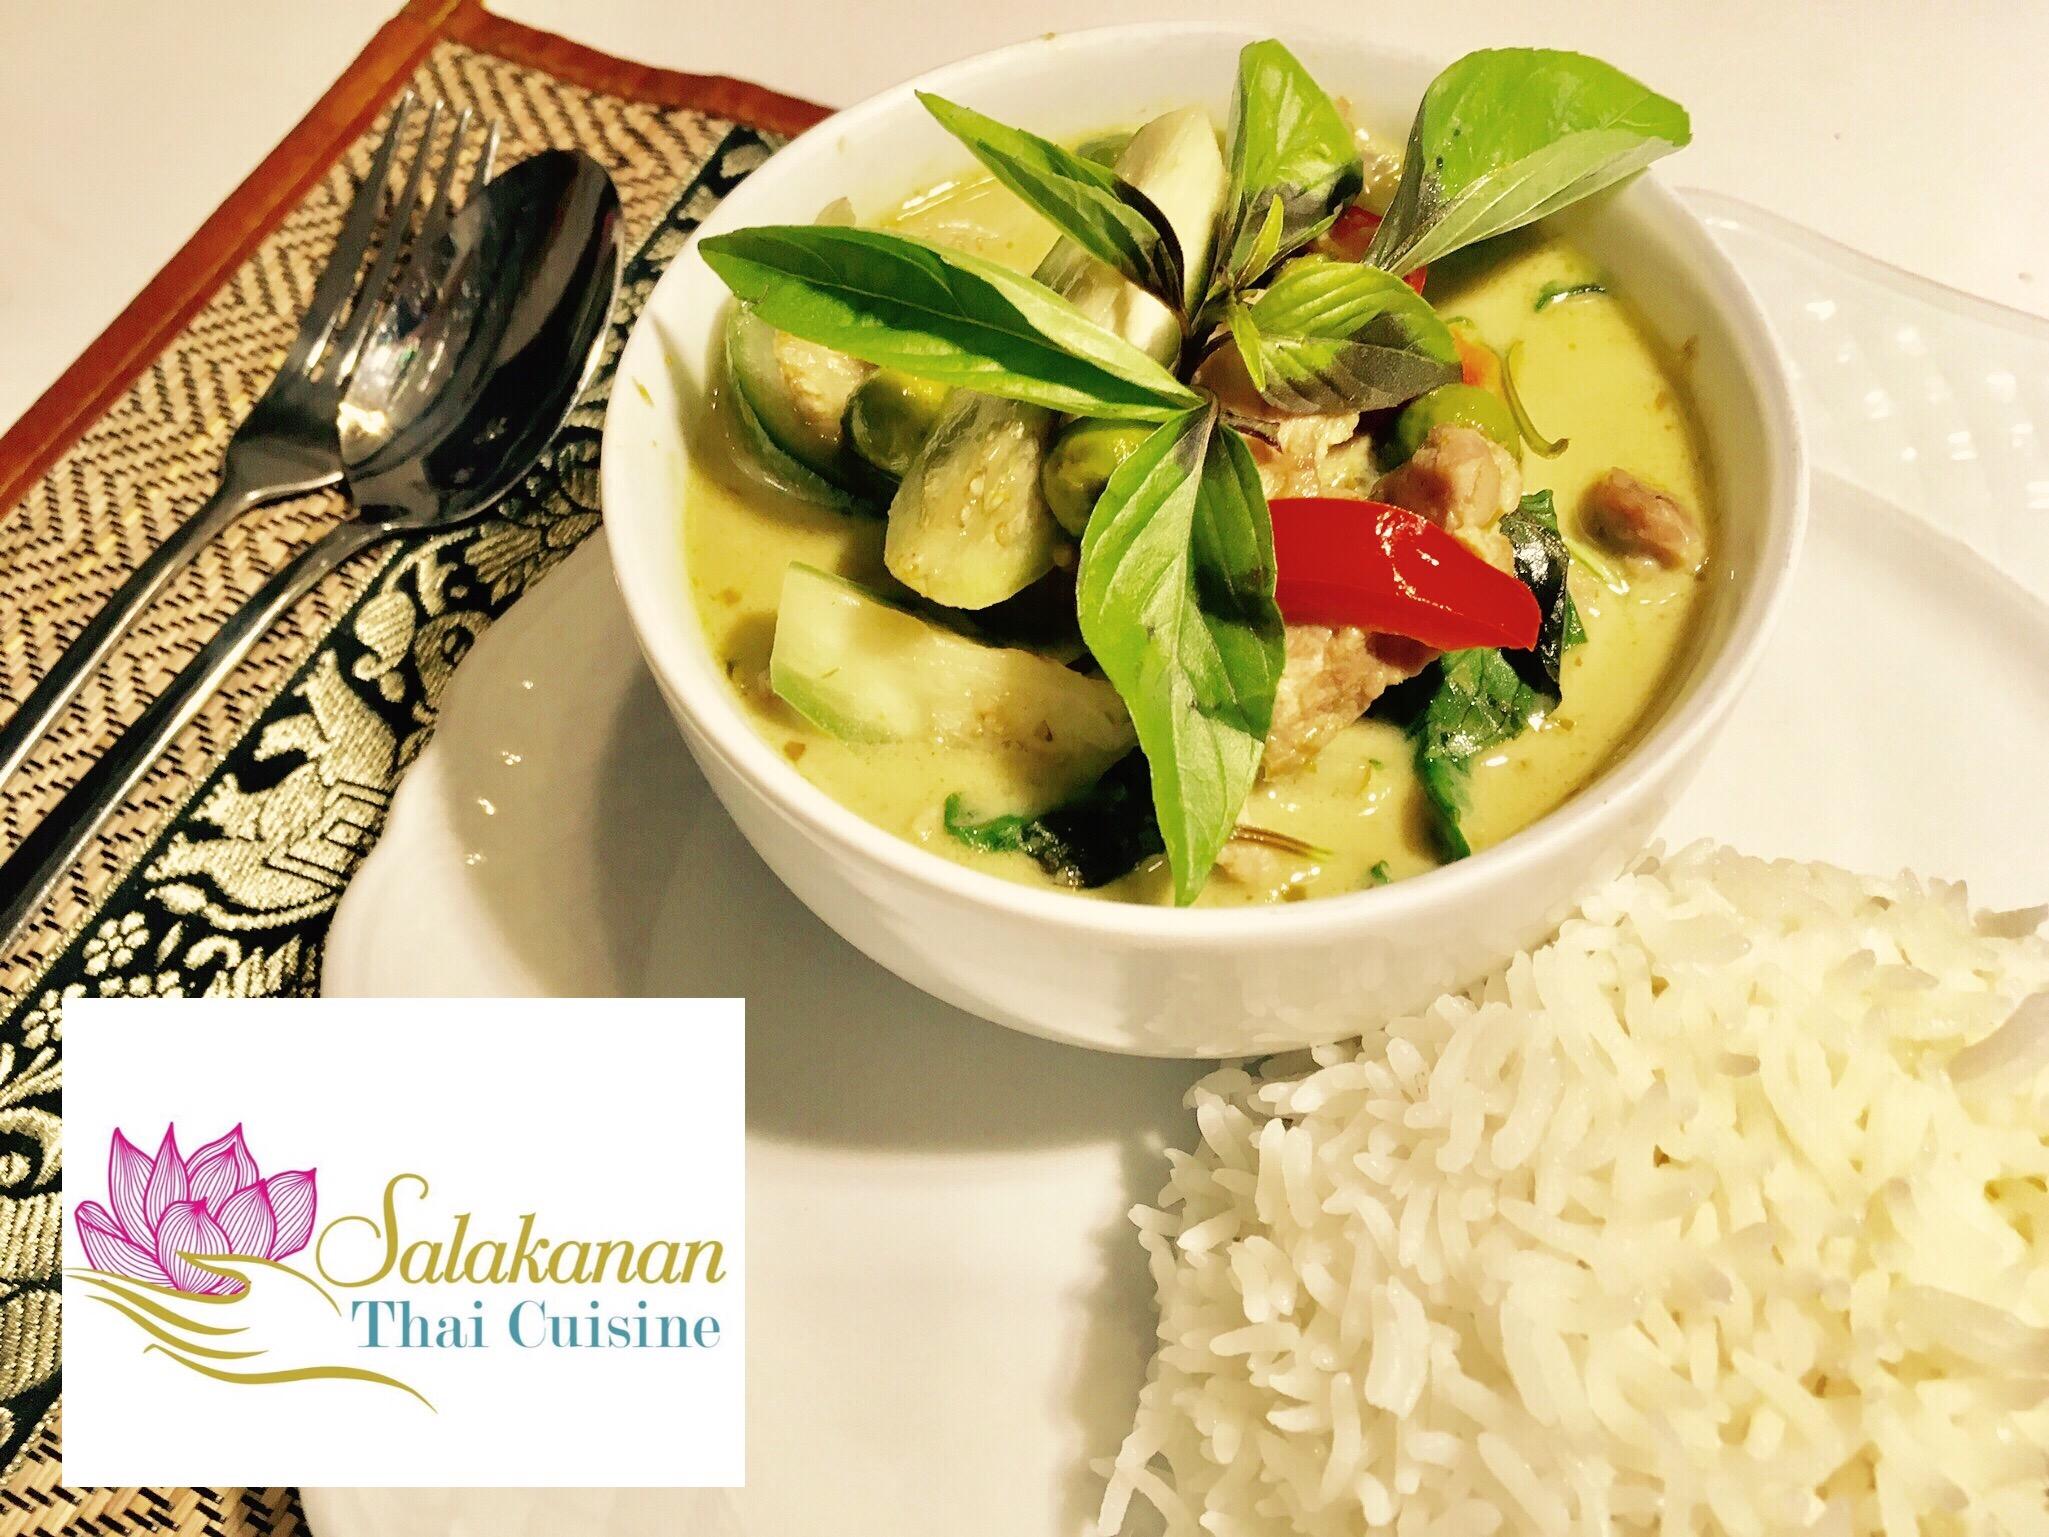 GRÜNER THAI-CURRY Salakanan Thai Restaurant Offenburg